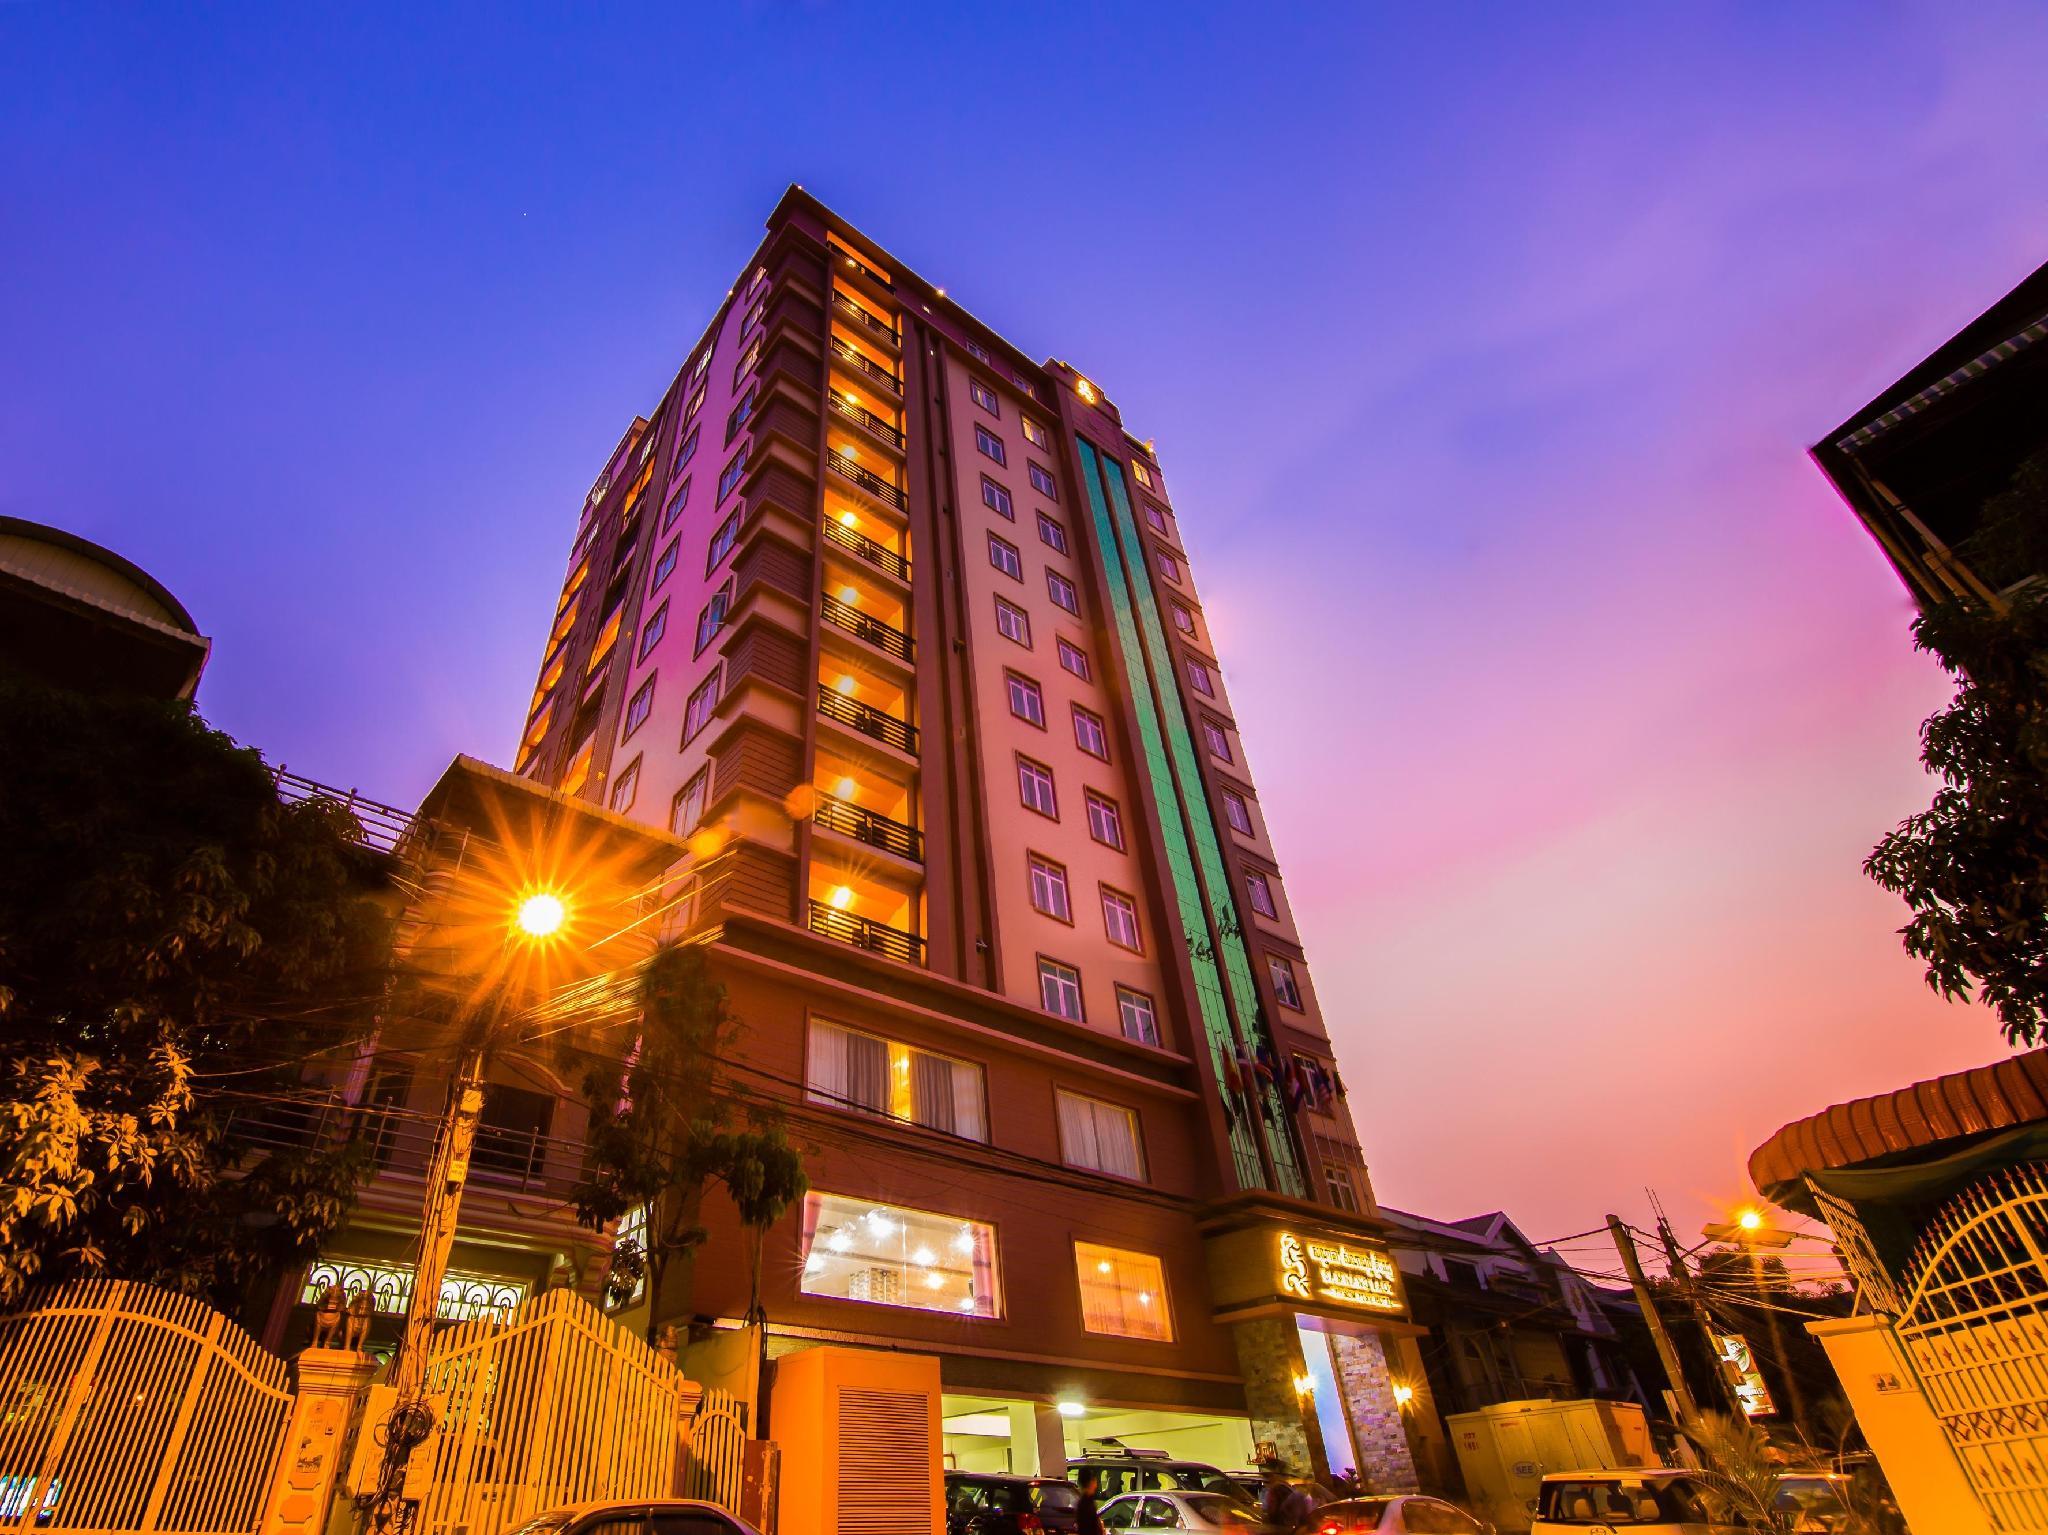 Samnang Laor Phnom Penh Hotel